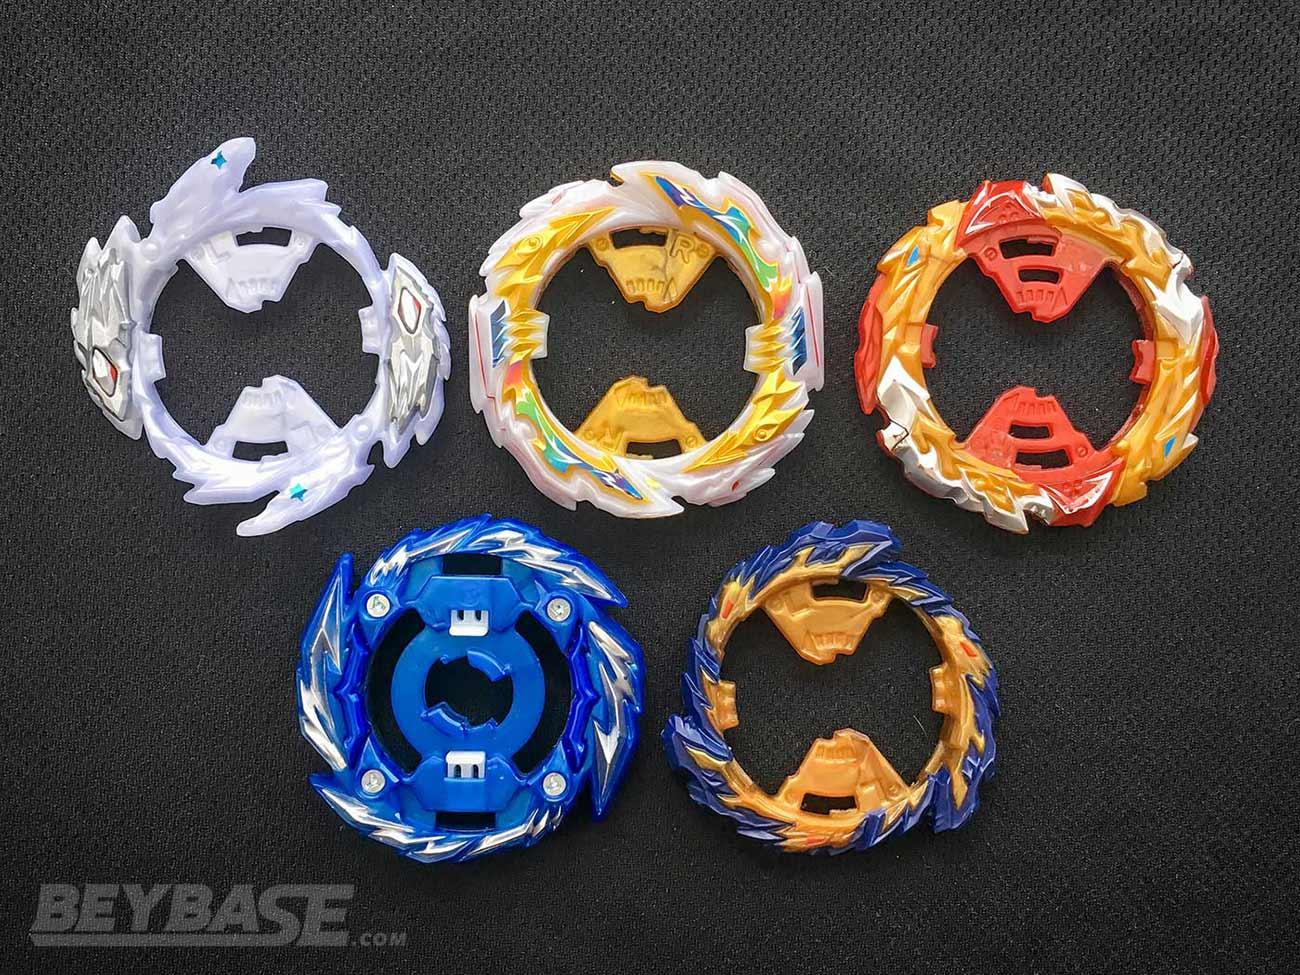 popular beyblade burst rings: rage, tempest, world, mirage, master